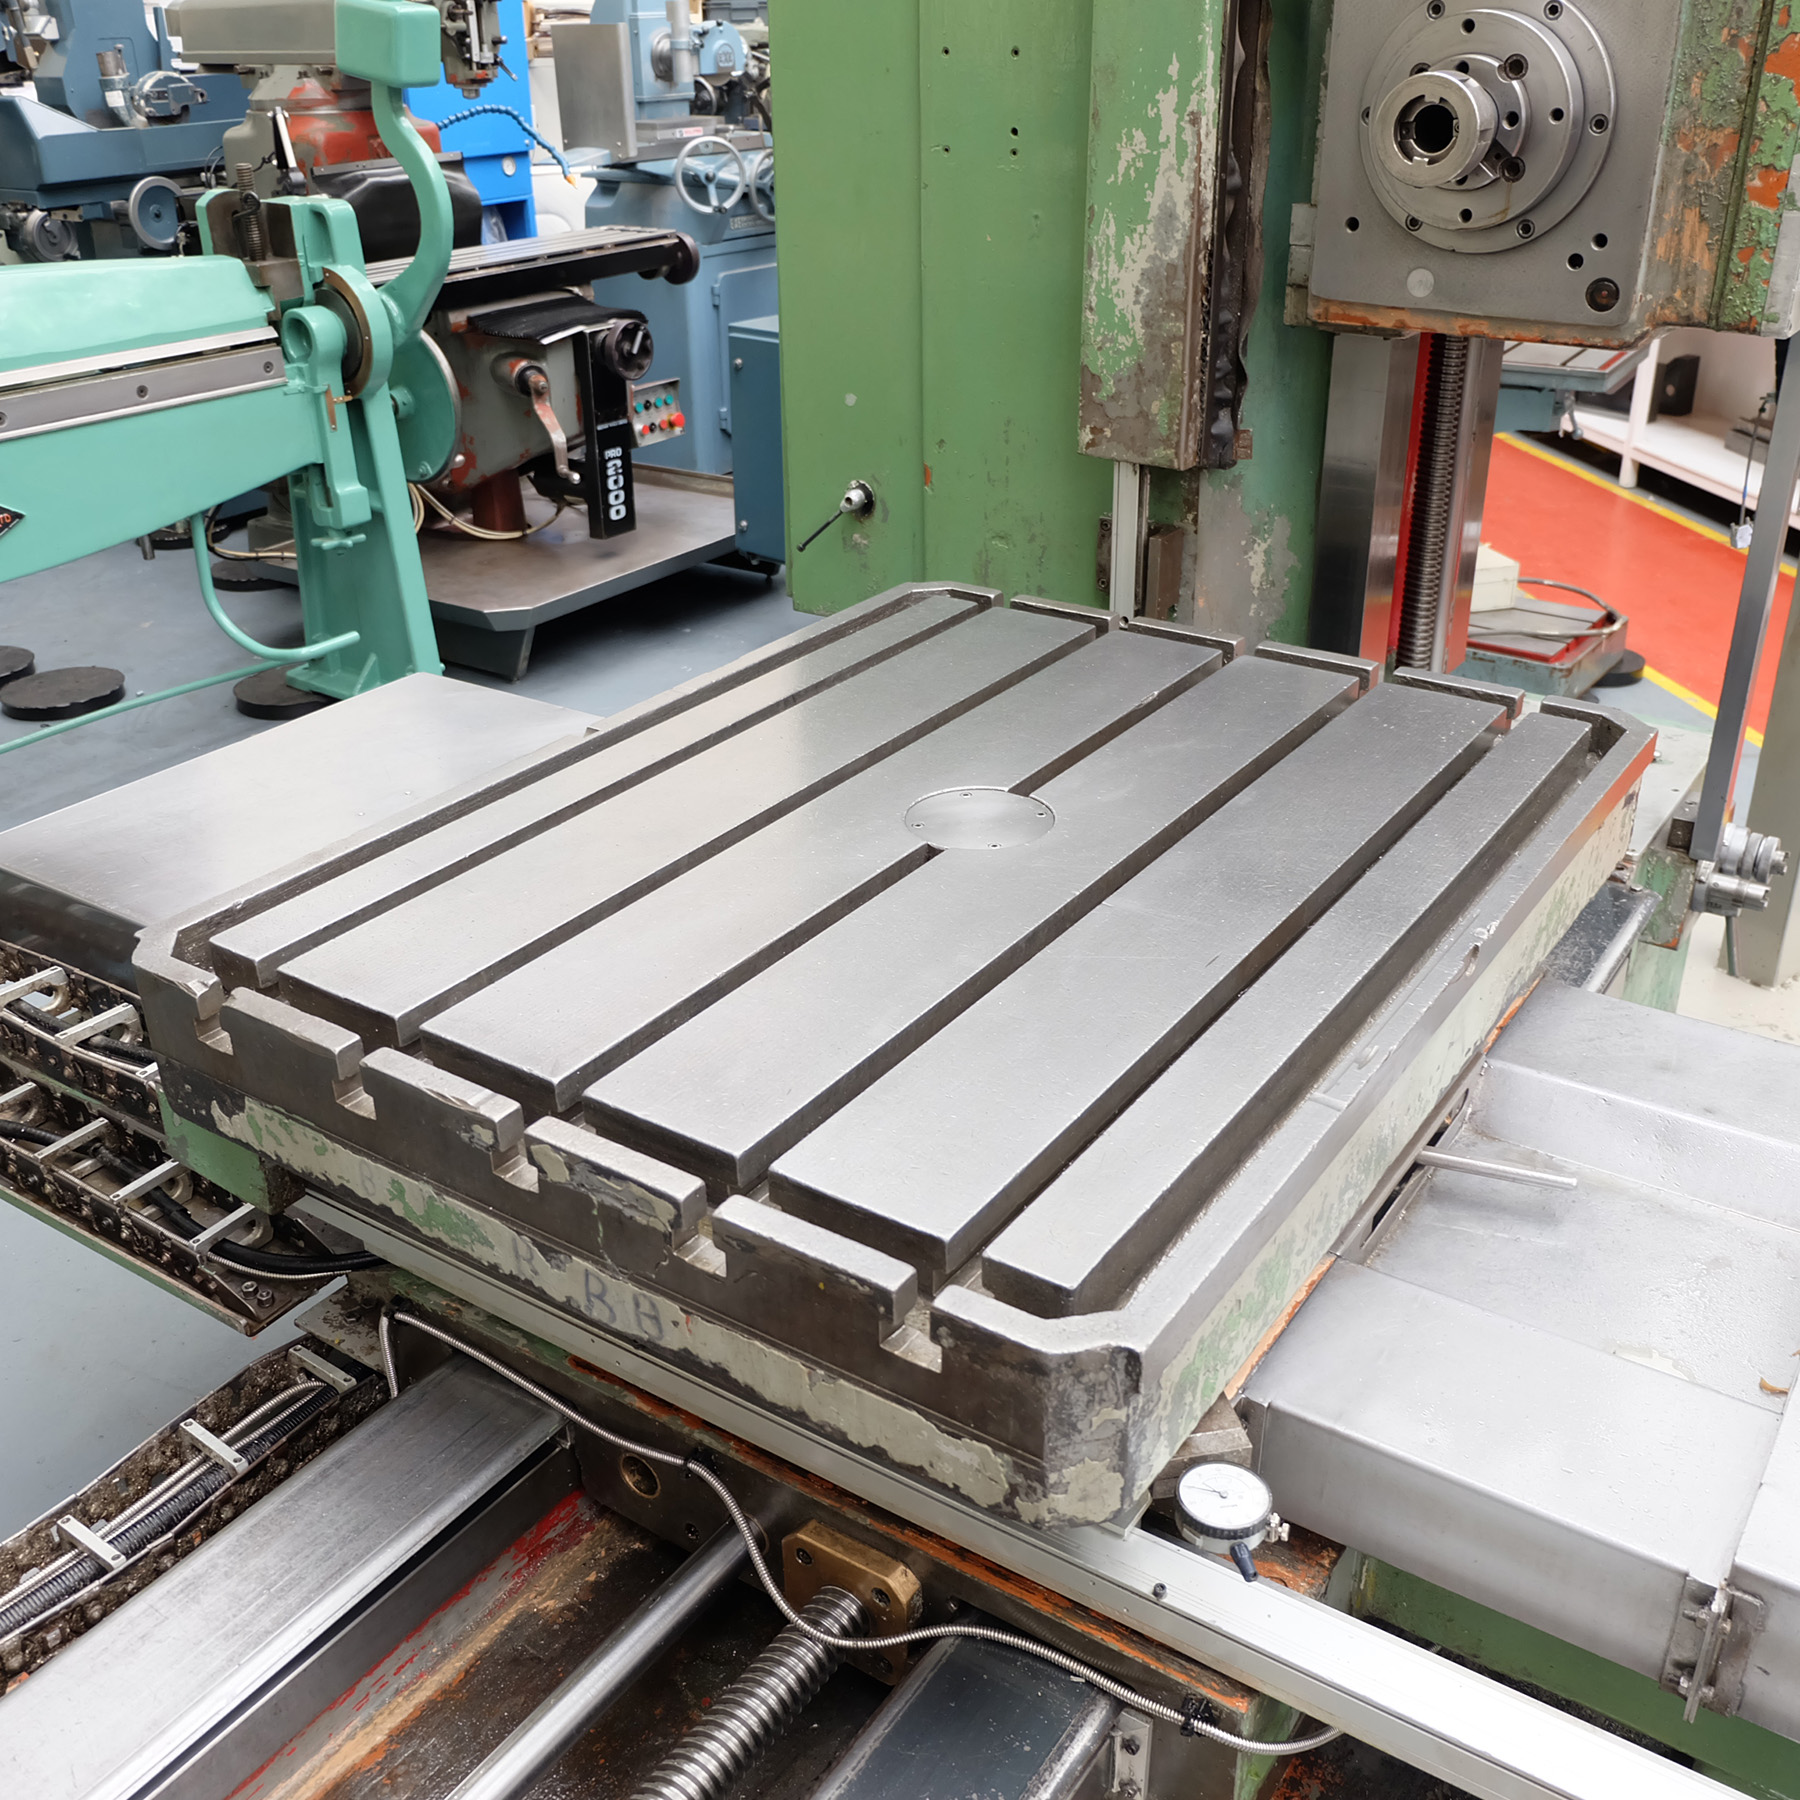 Ceruti Model ABC 75 Horizontal Boring & Milling Machine. With Tooling. - Image 5 of 15